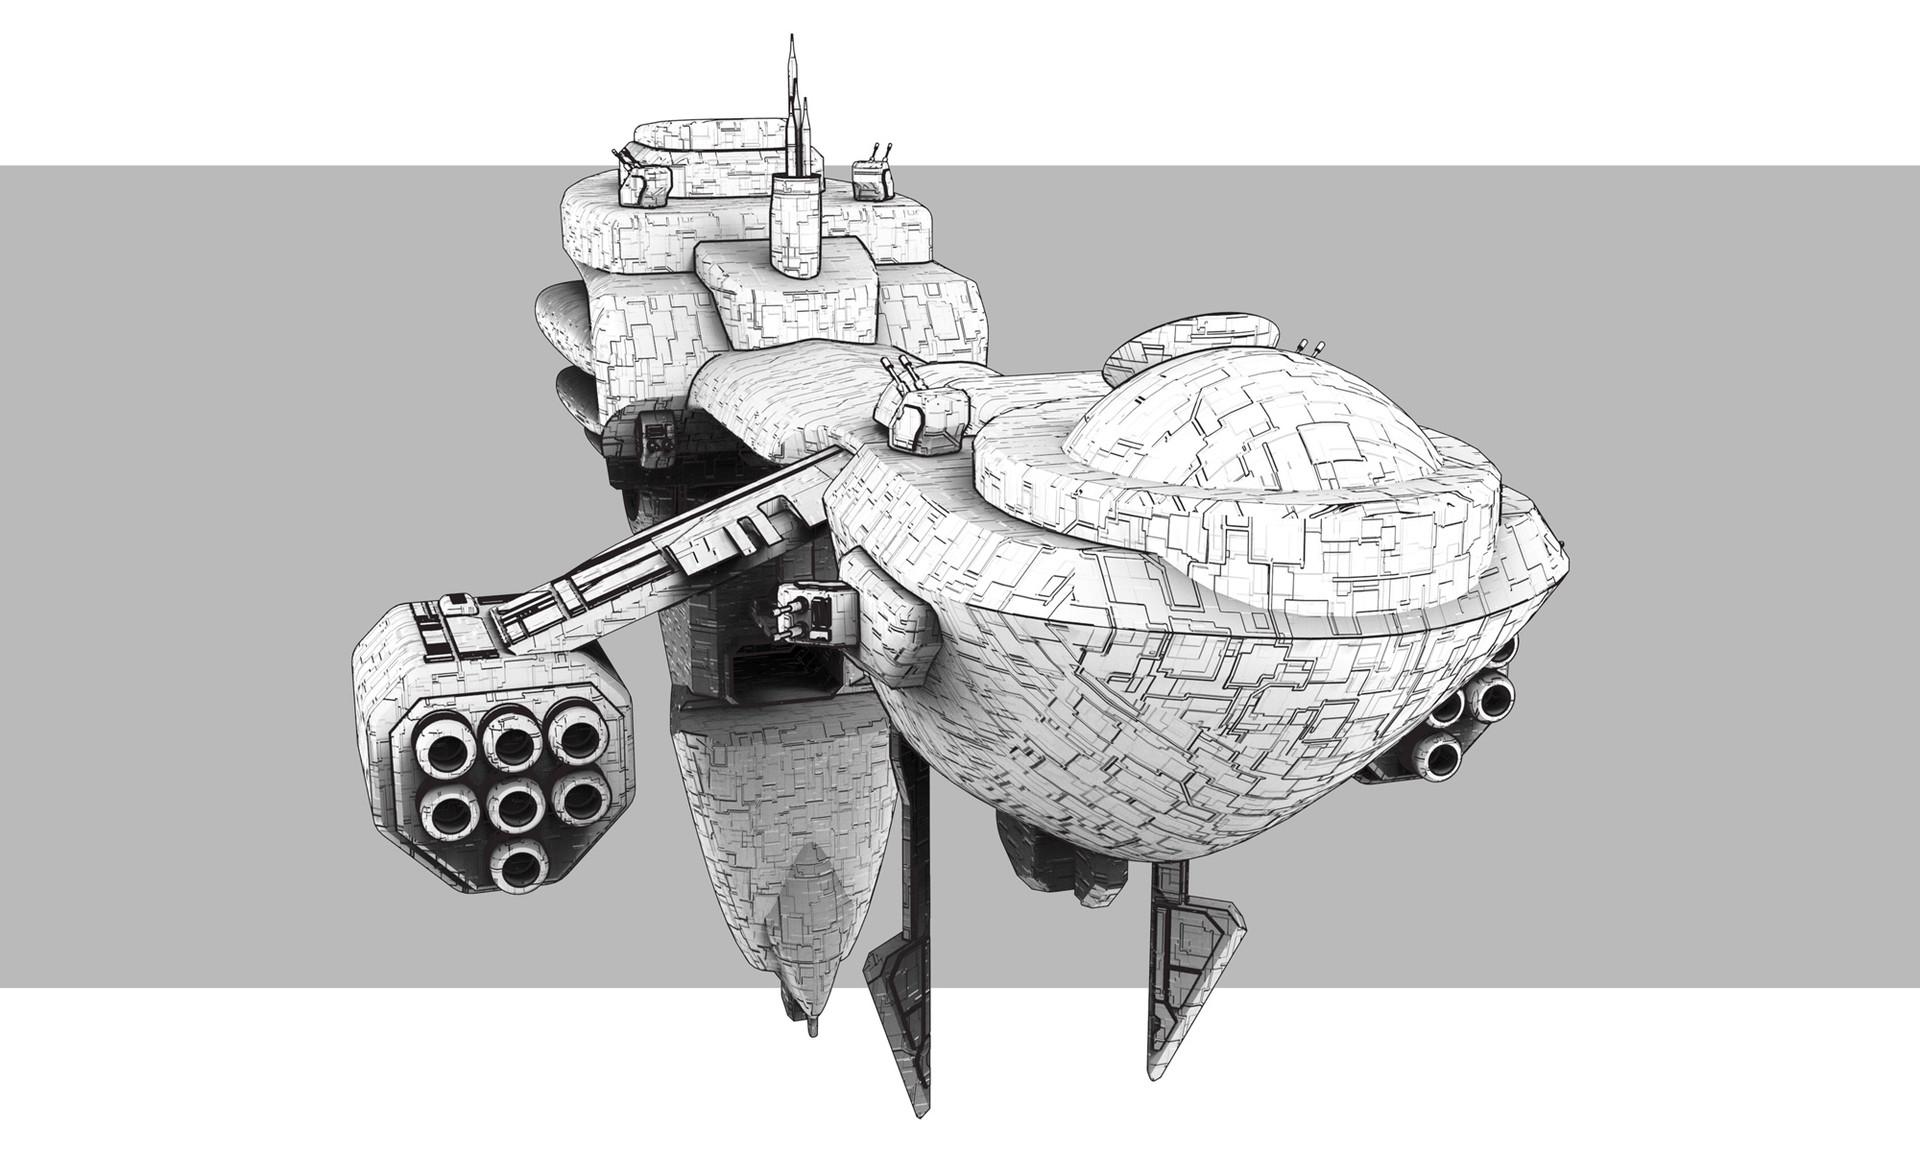 Alejandro gonzalez star wars concept art ef97 c